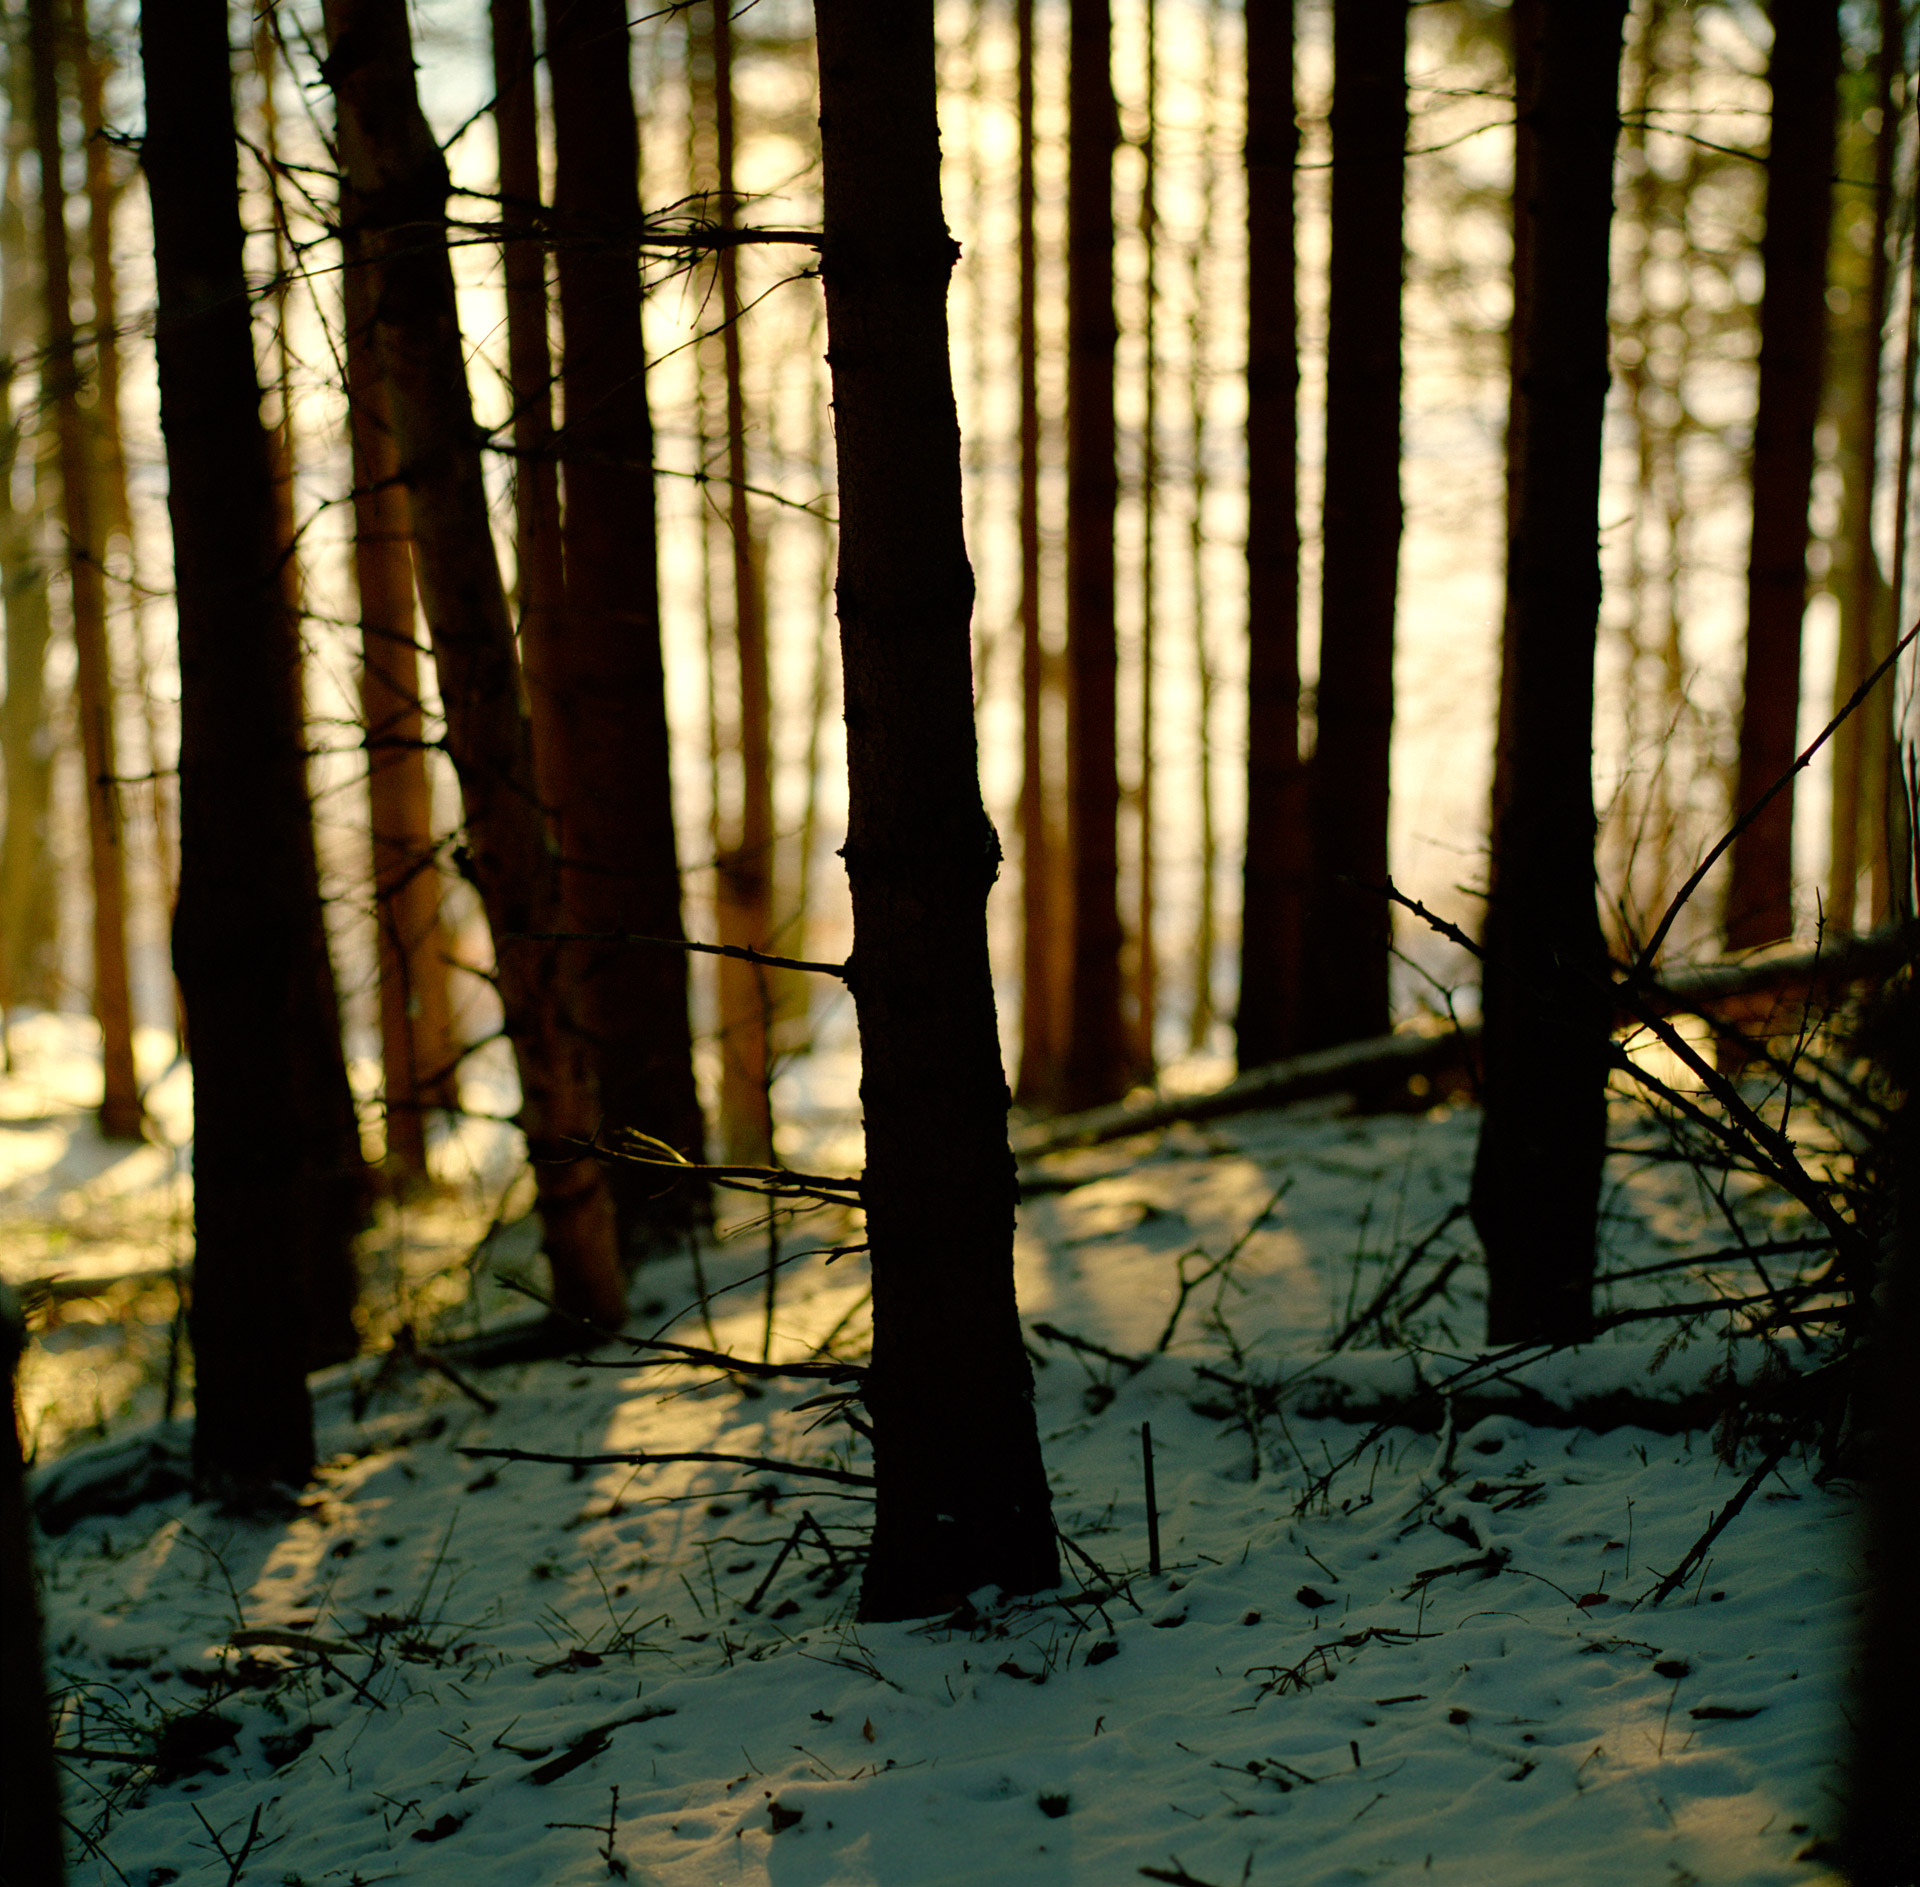 Trees at Mølleåen Bagsværd Sø in winter with snow